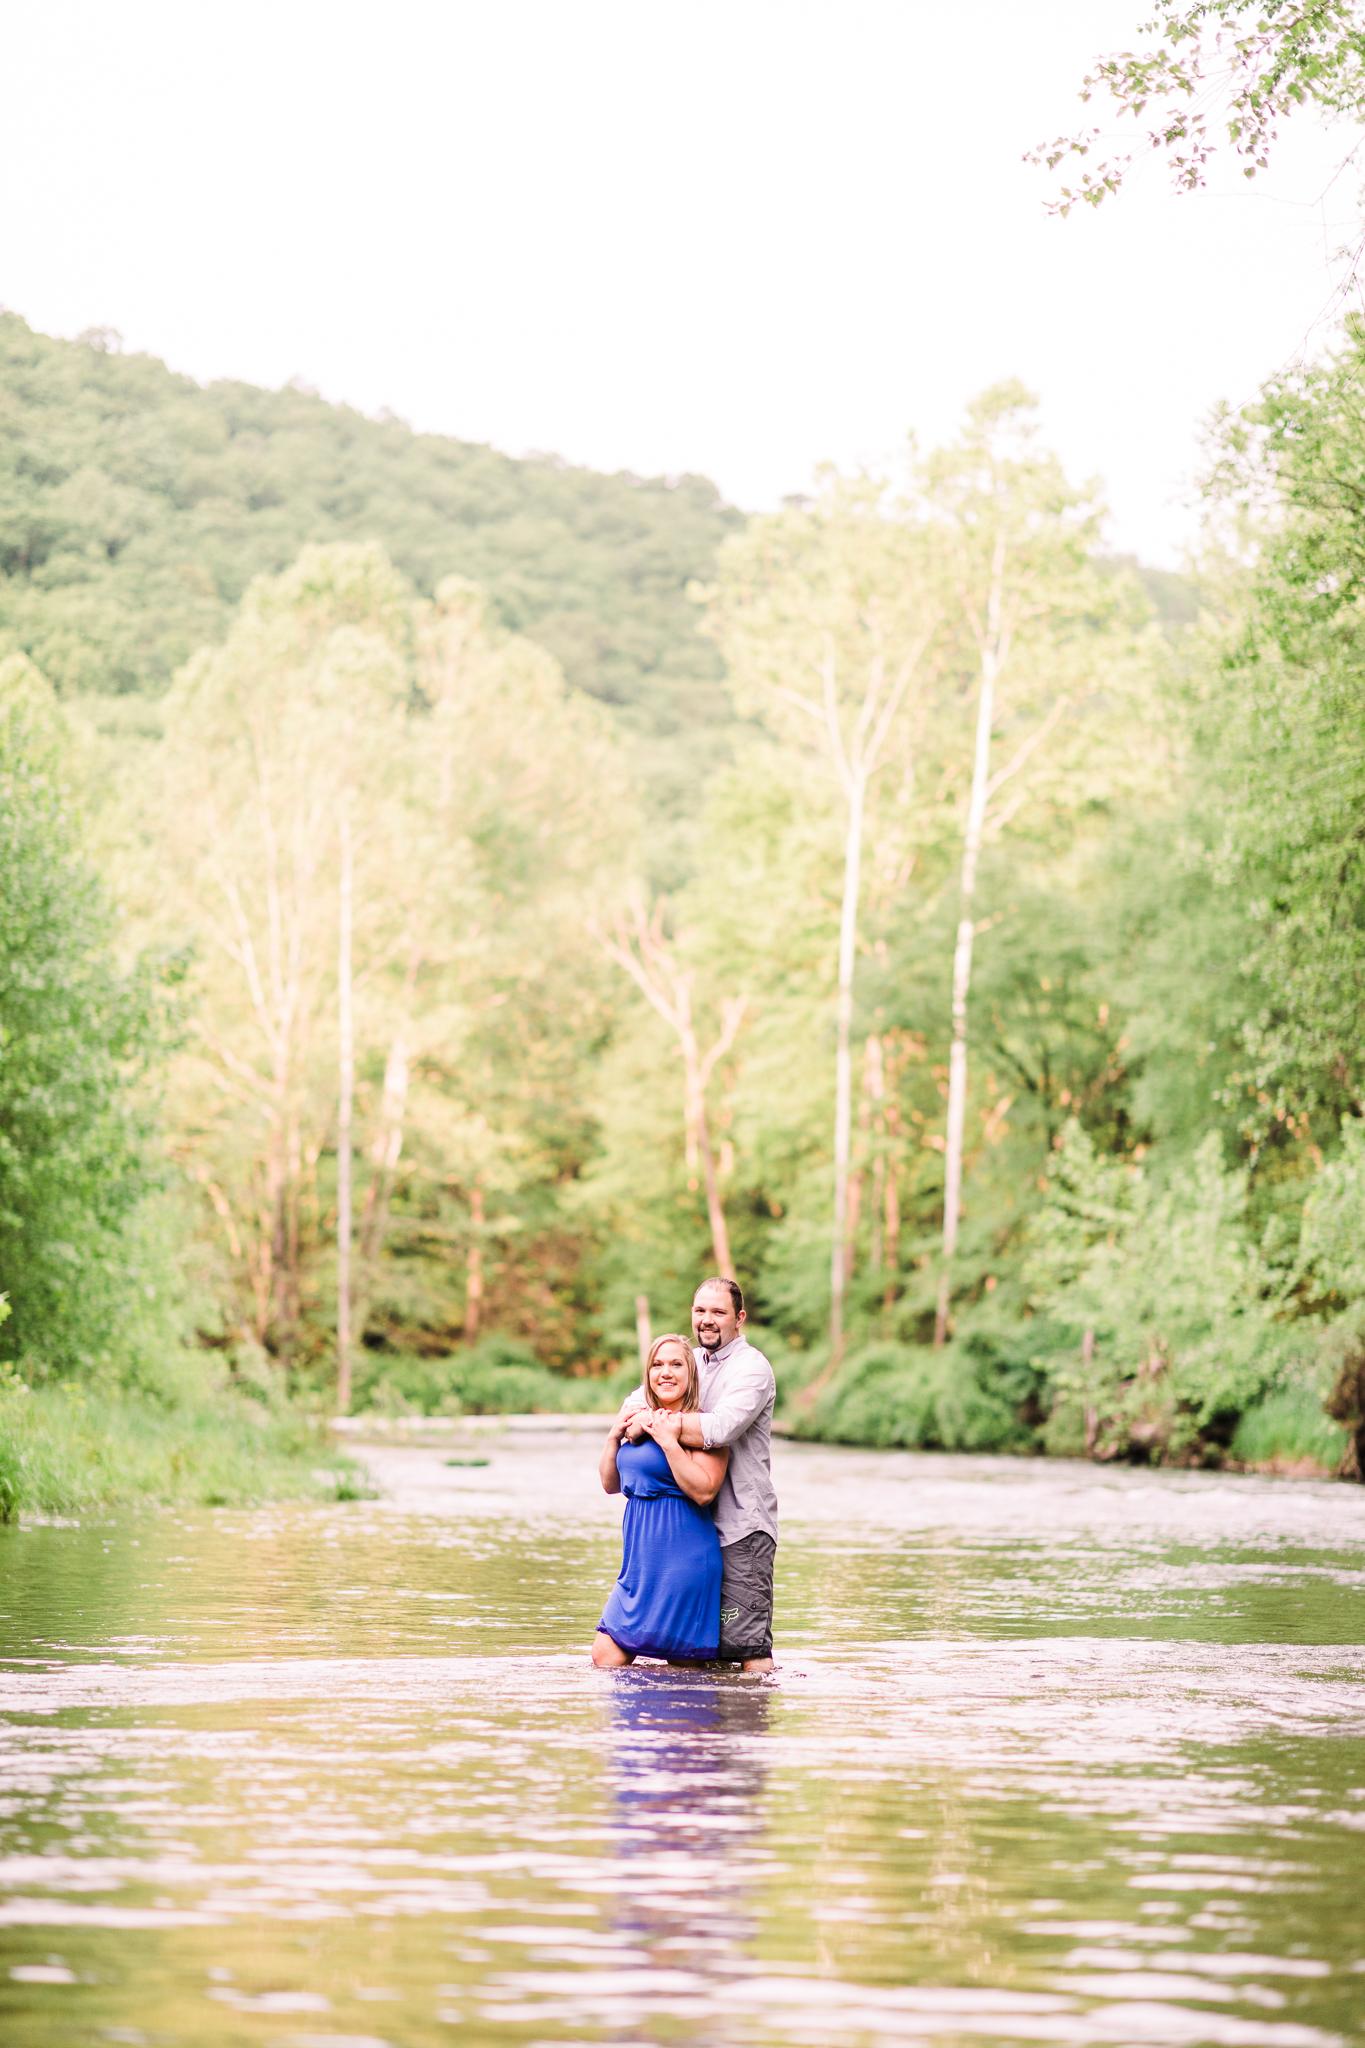 Kettle-creek-state-park-engagement-9675.jpg